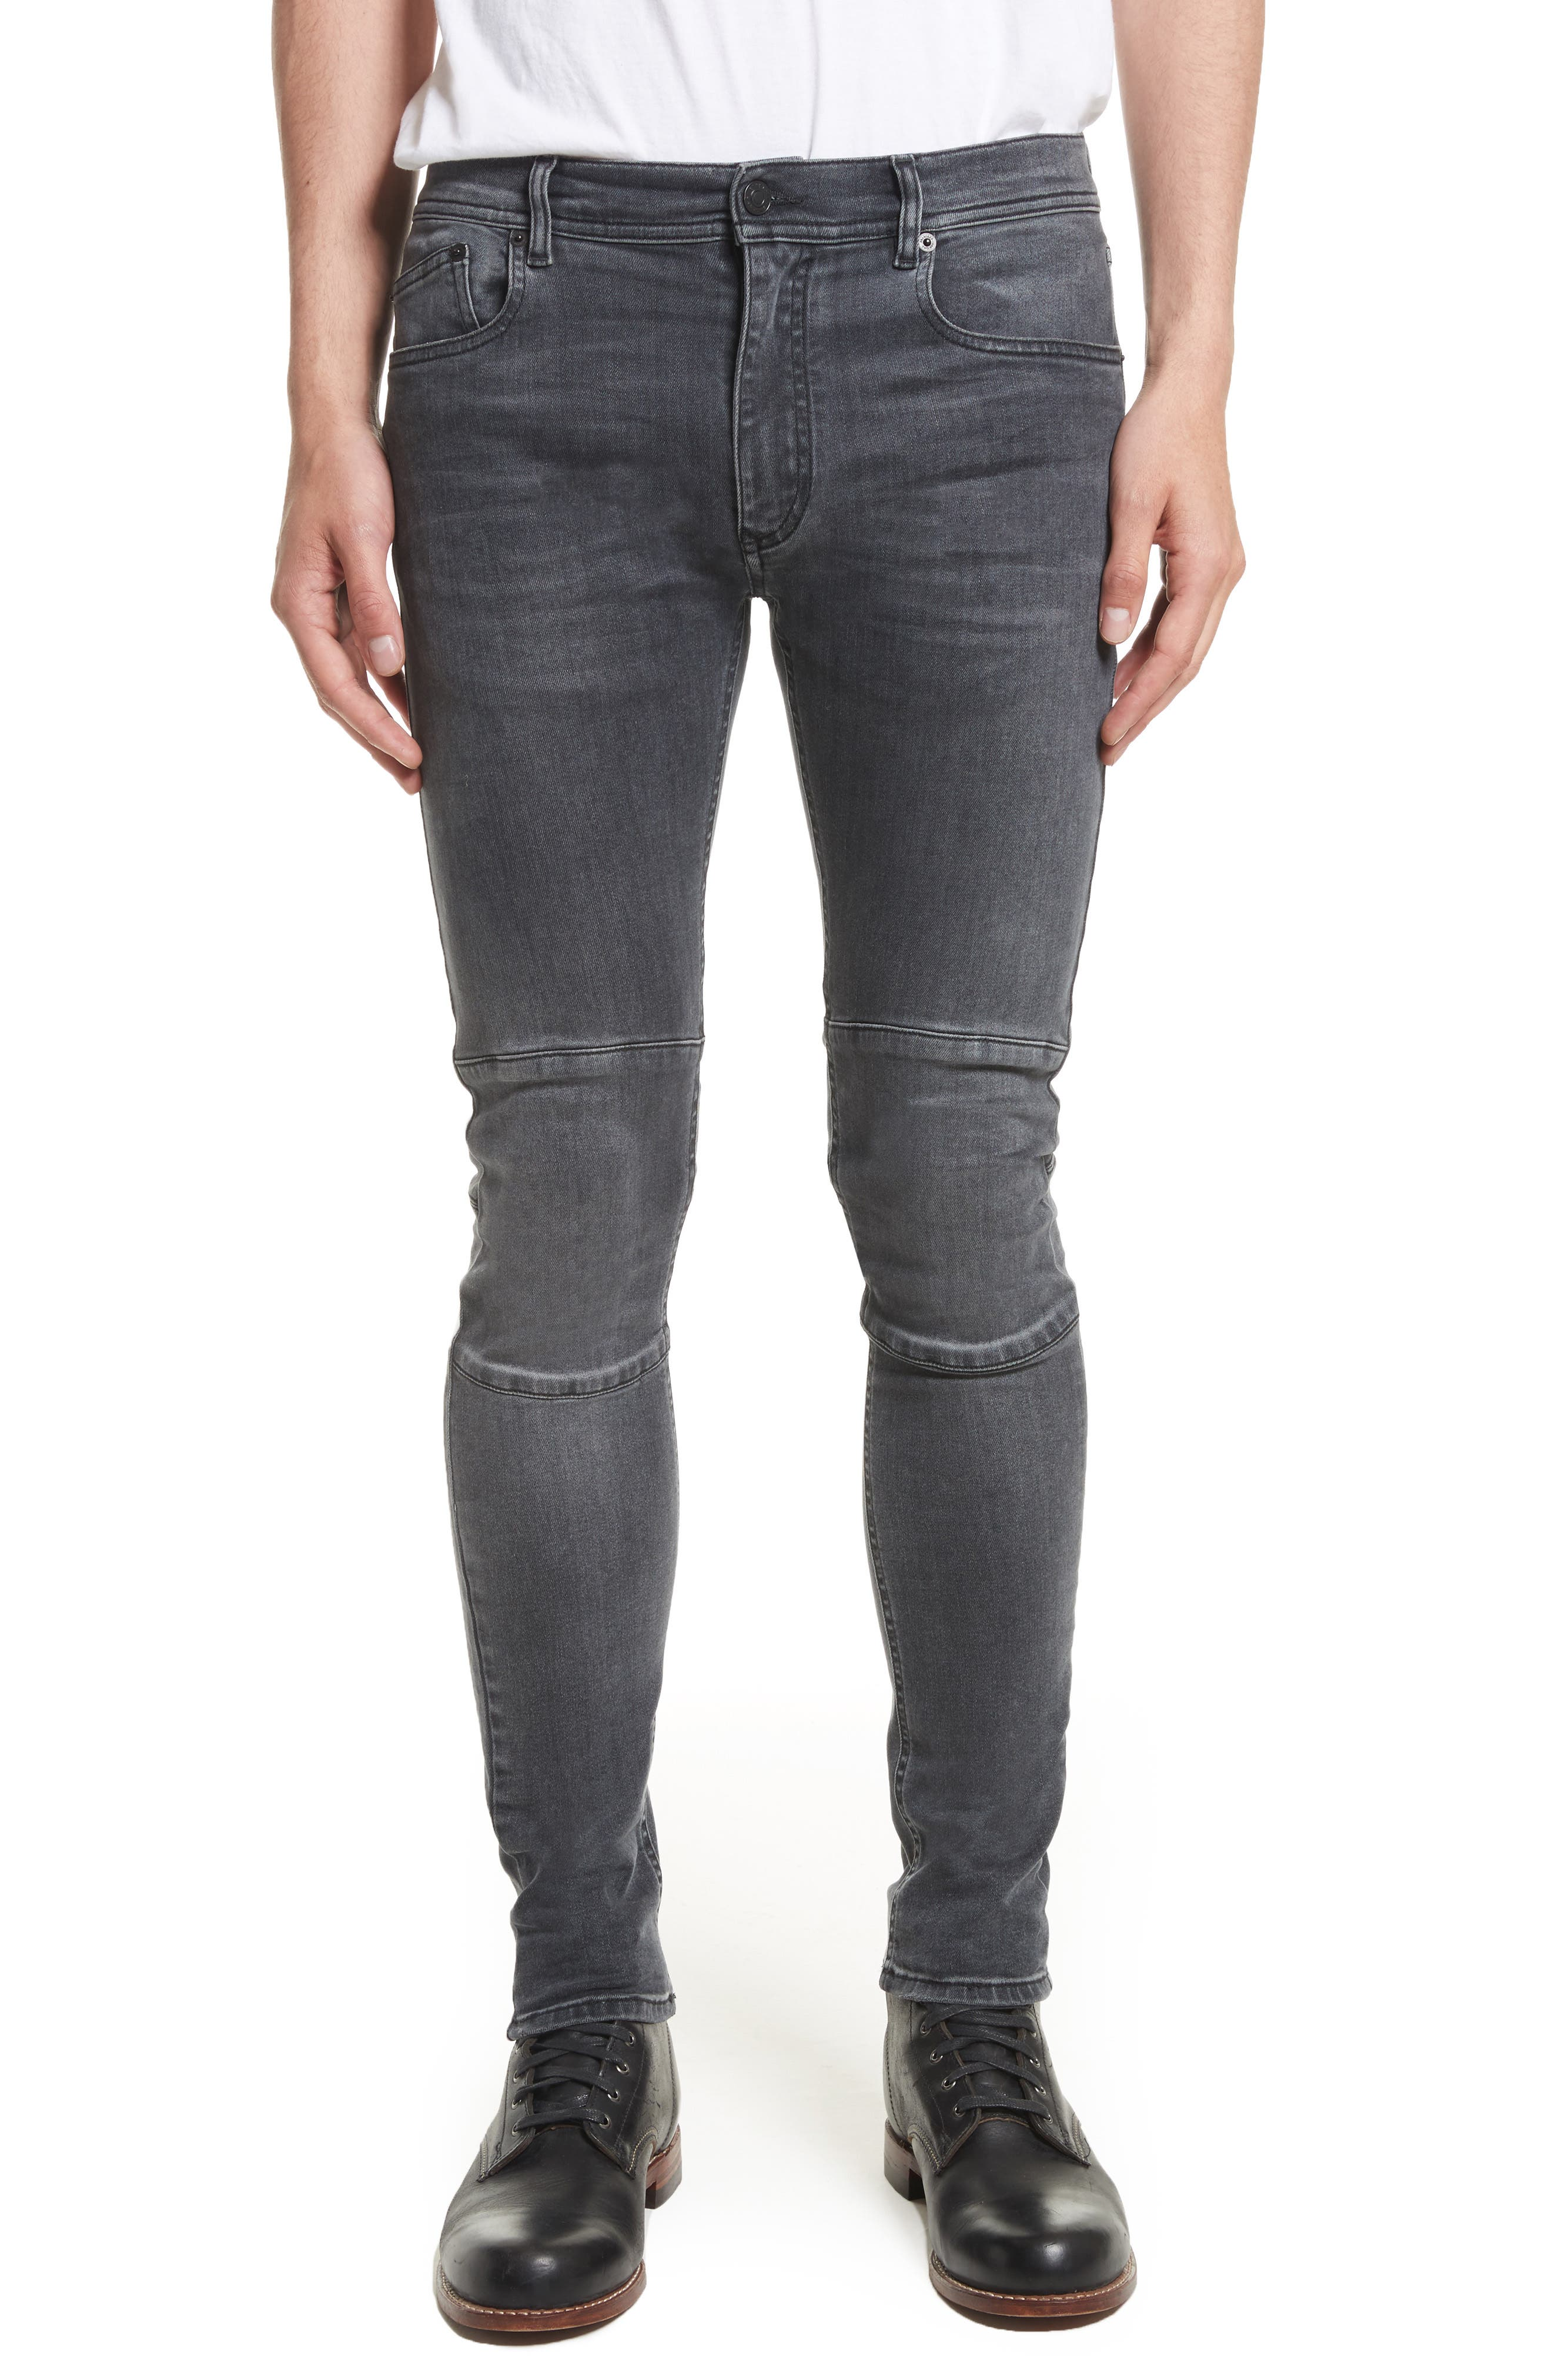 Tattenhall Washed Denim Skinny Jeans,                         Main,                         color, 022